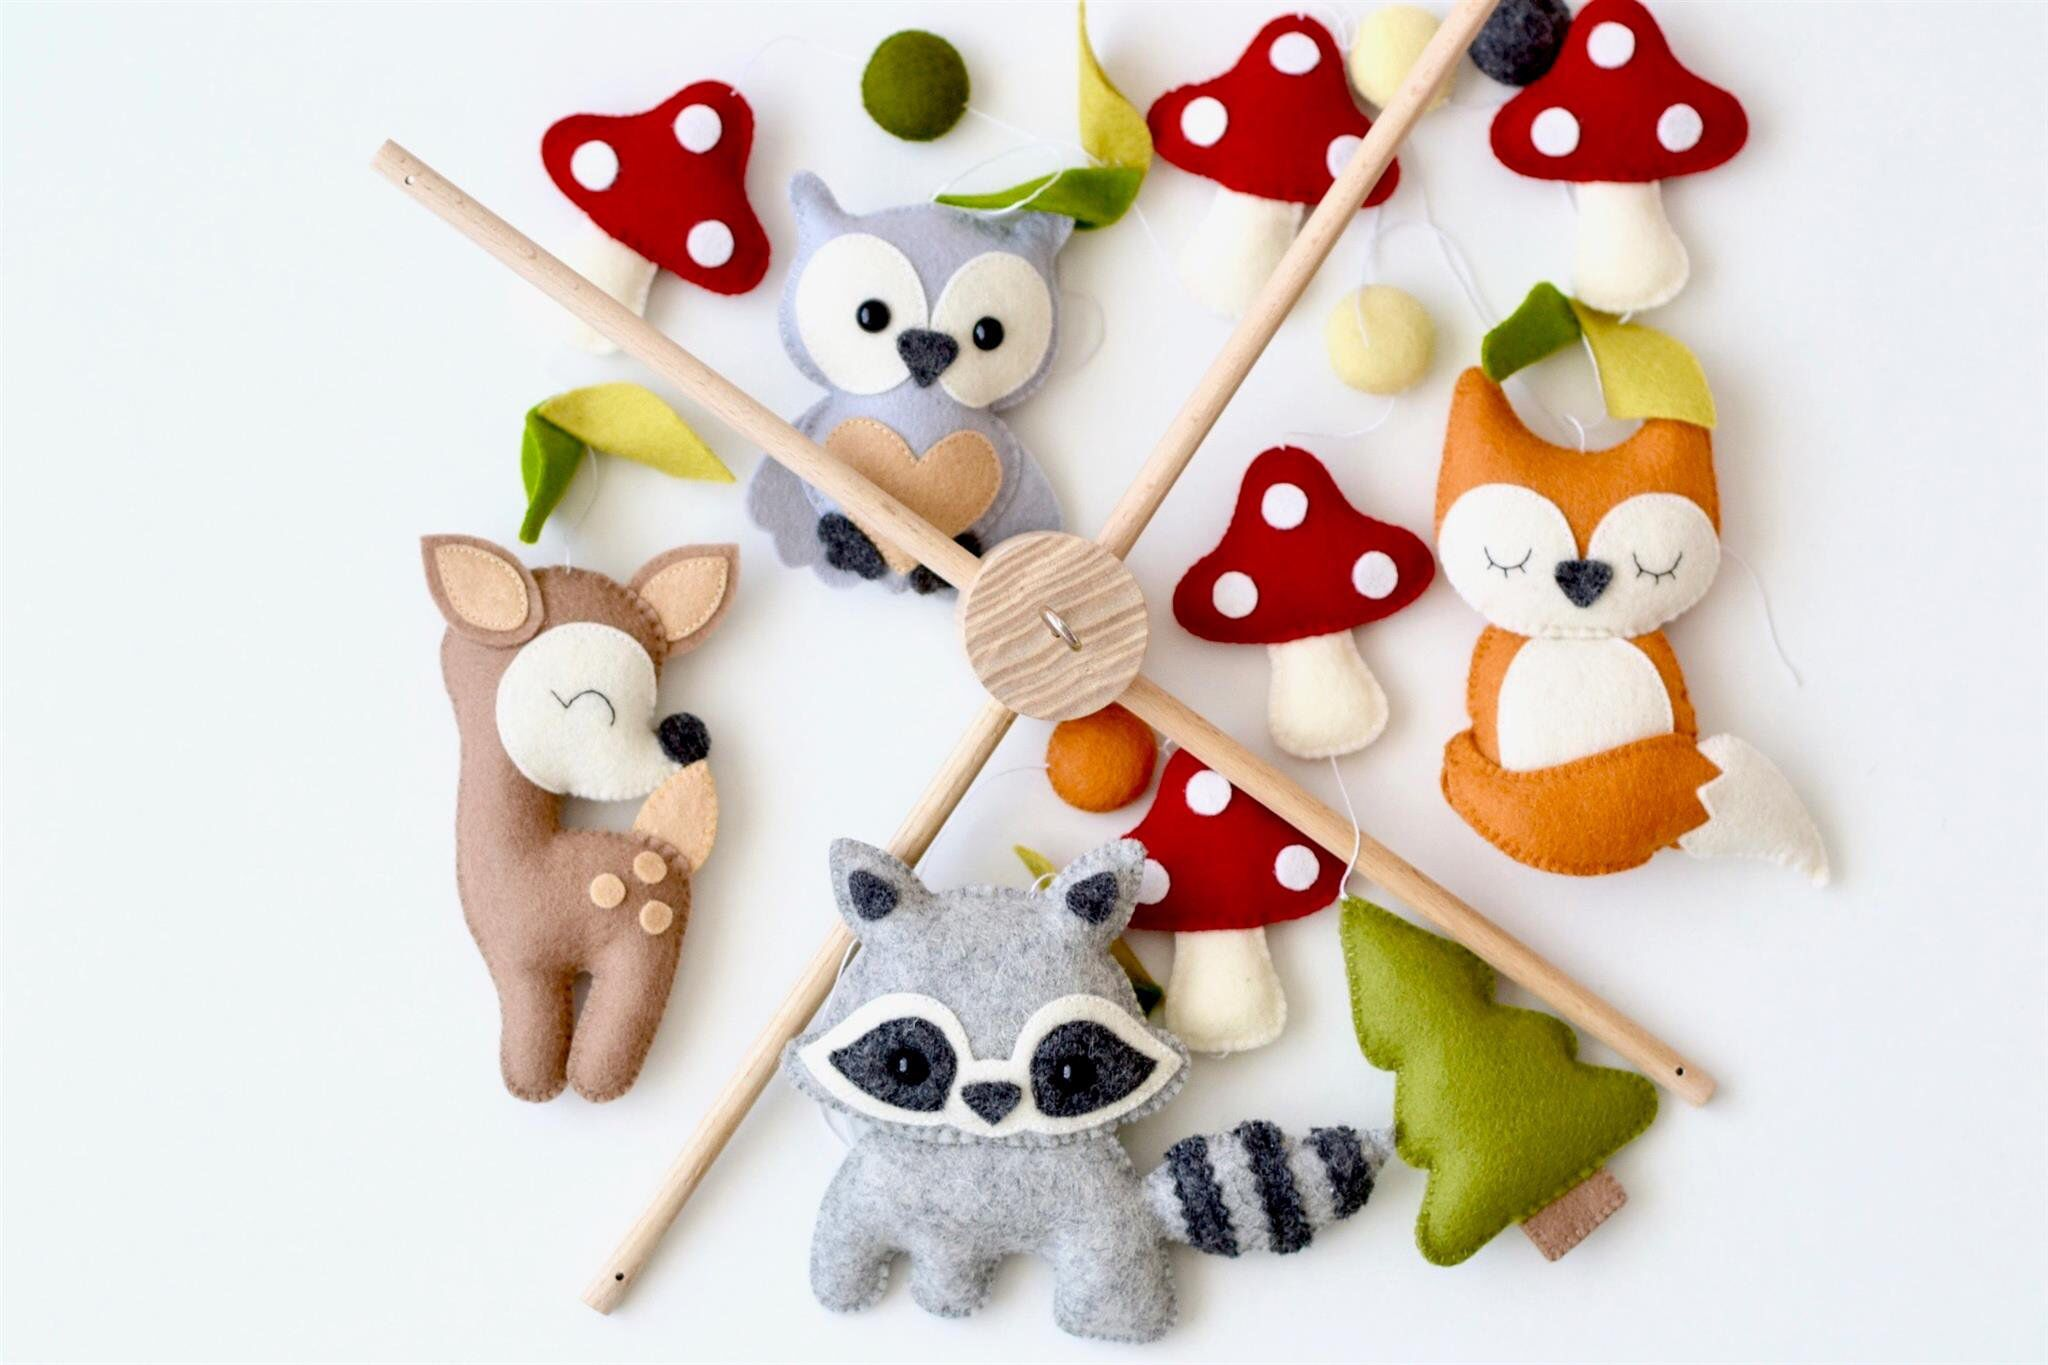 Baby Mobile Waldtiere. Baby mobile, Baby-Dusche-Geschenk, neue Baby-Geschenk, Filz Tiere Spielzeug, Baby mobile Wald, Wald mobile